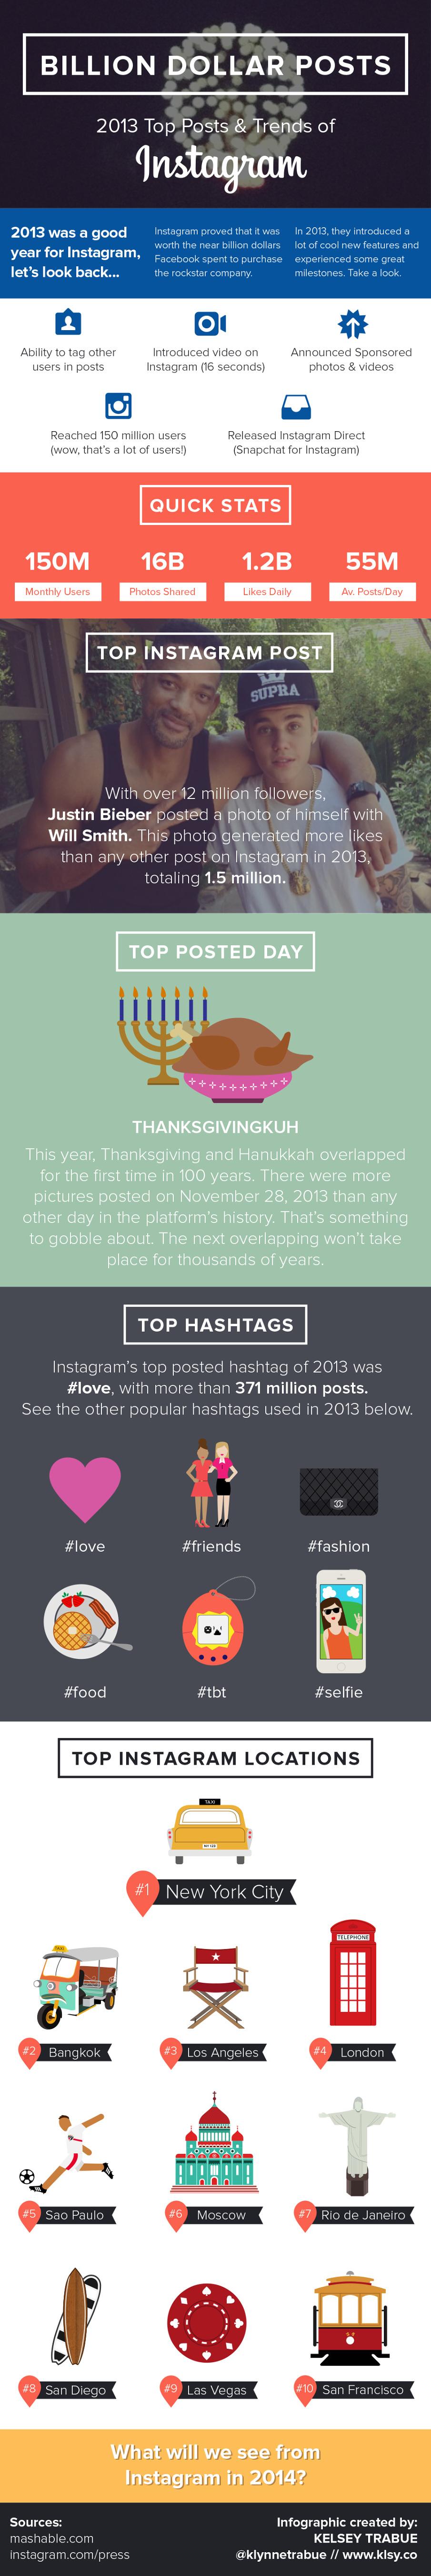 07 infographic-girl-Instagram_905 (1)